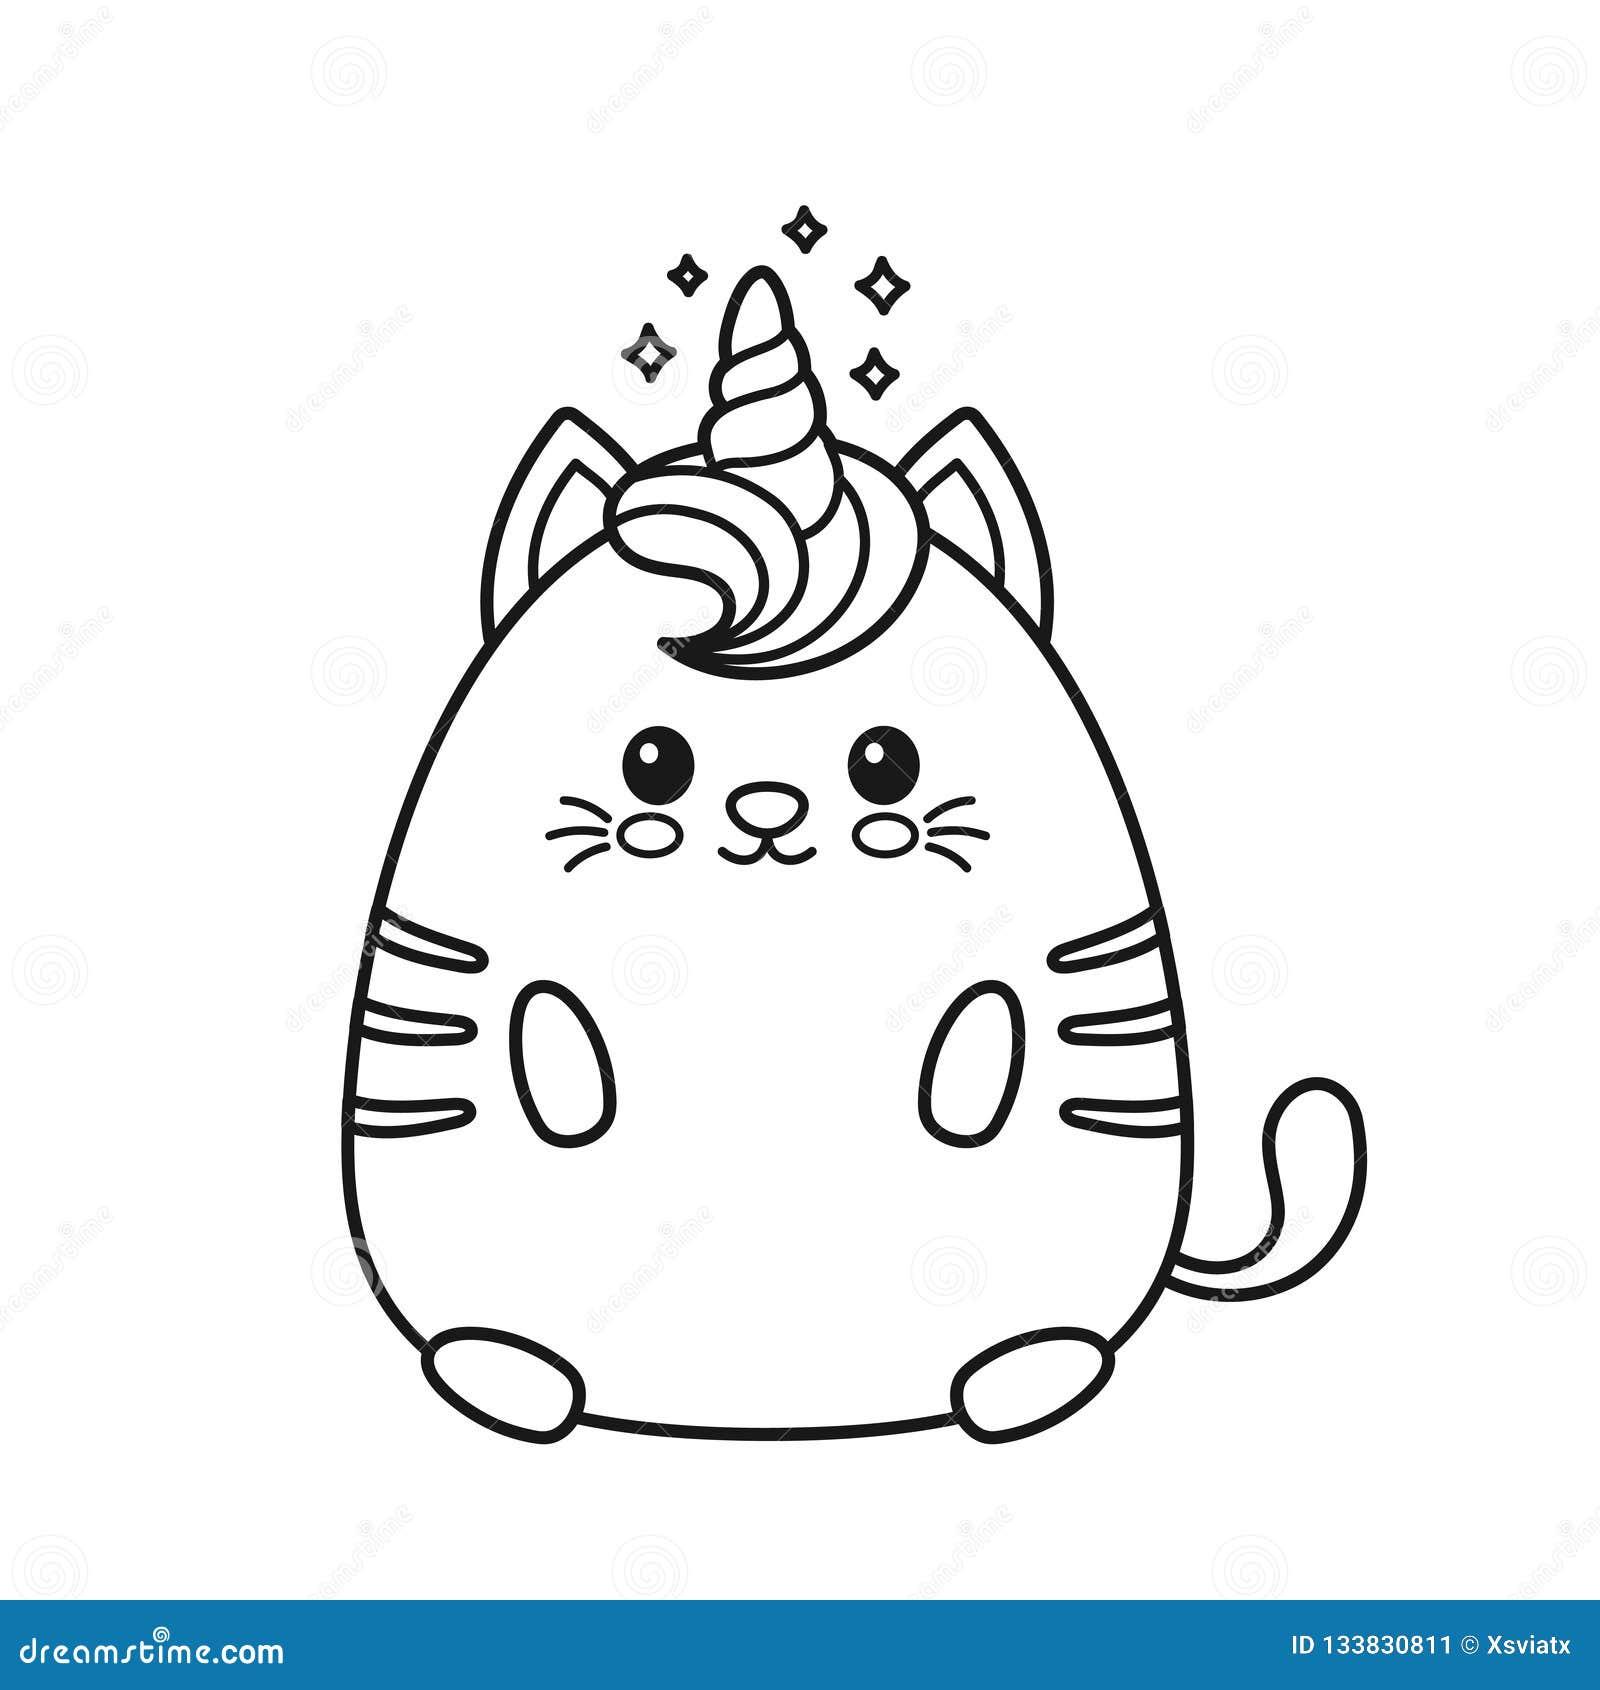 Cute Happy Smiling Unicorn Cat Stock Vector - Illustration ...